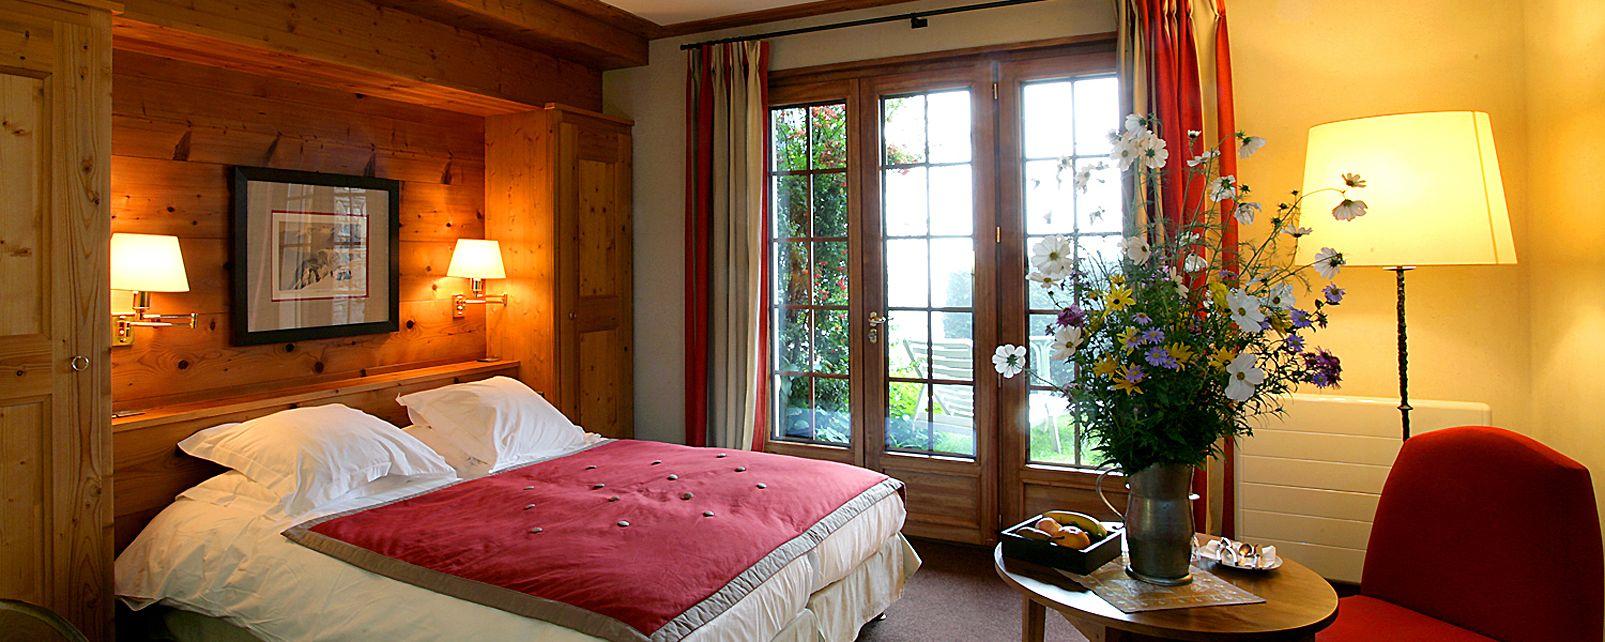 h tel auberge du bois prin chamonix mont blanc. Black Bedroom Furniture Sets. Home Design Ideas